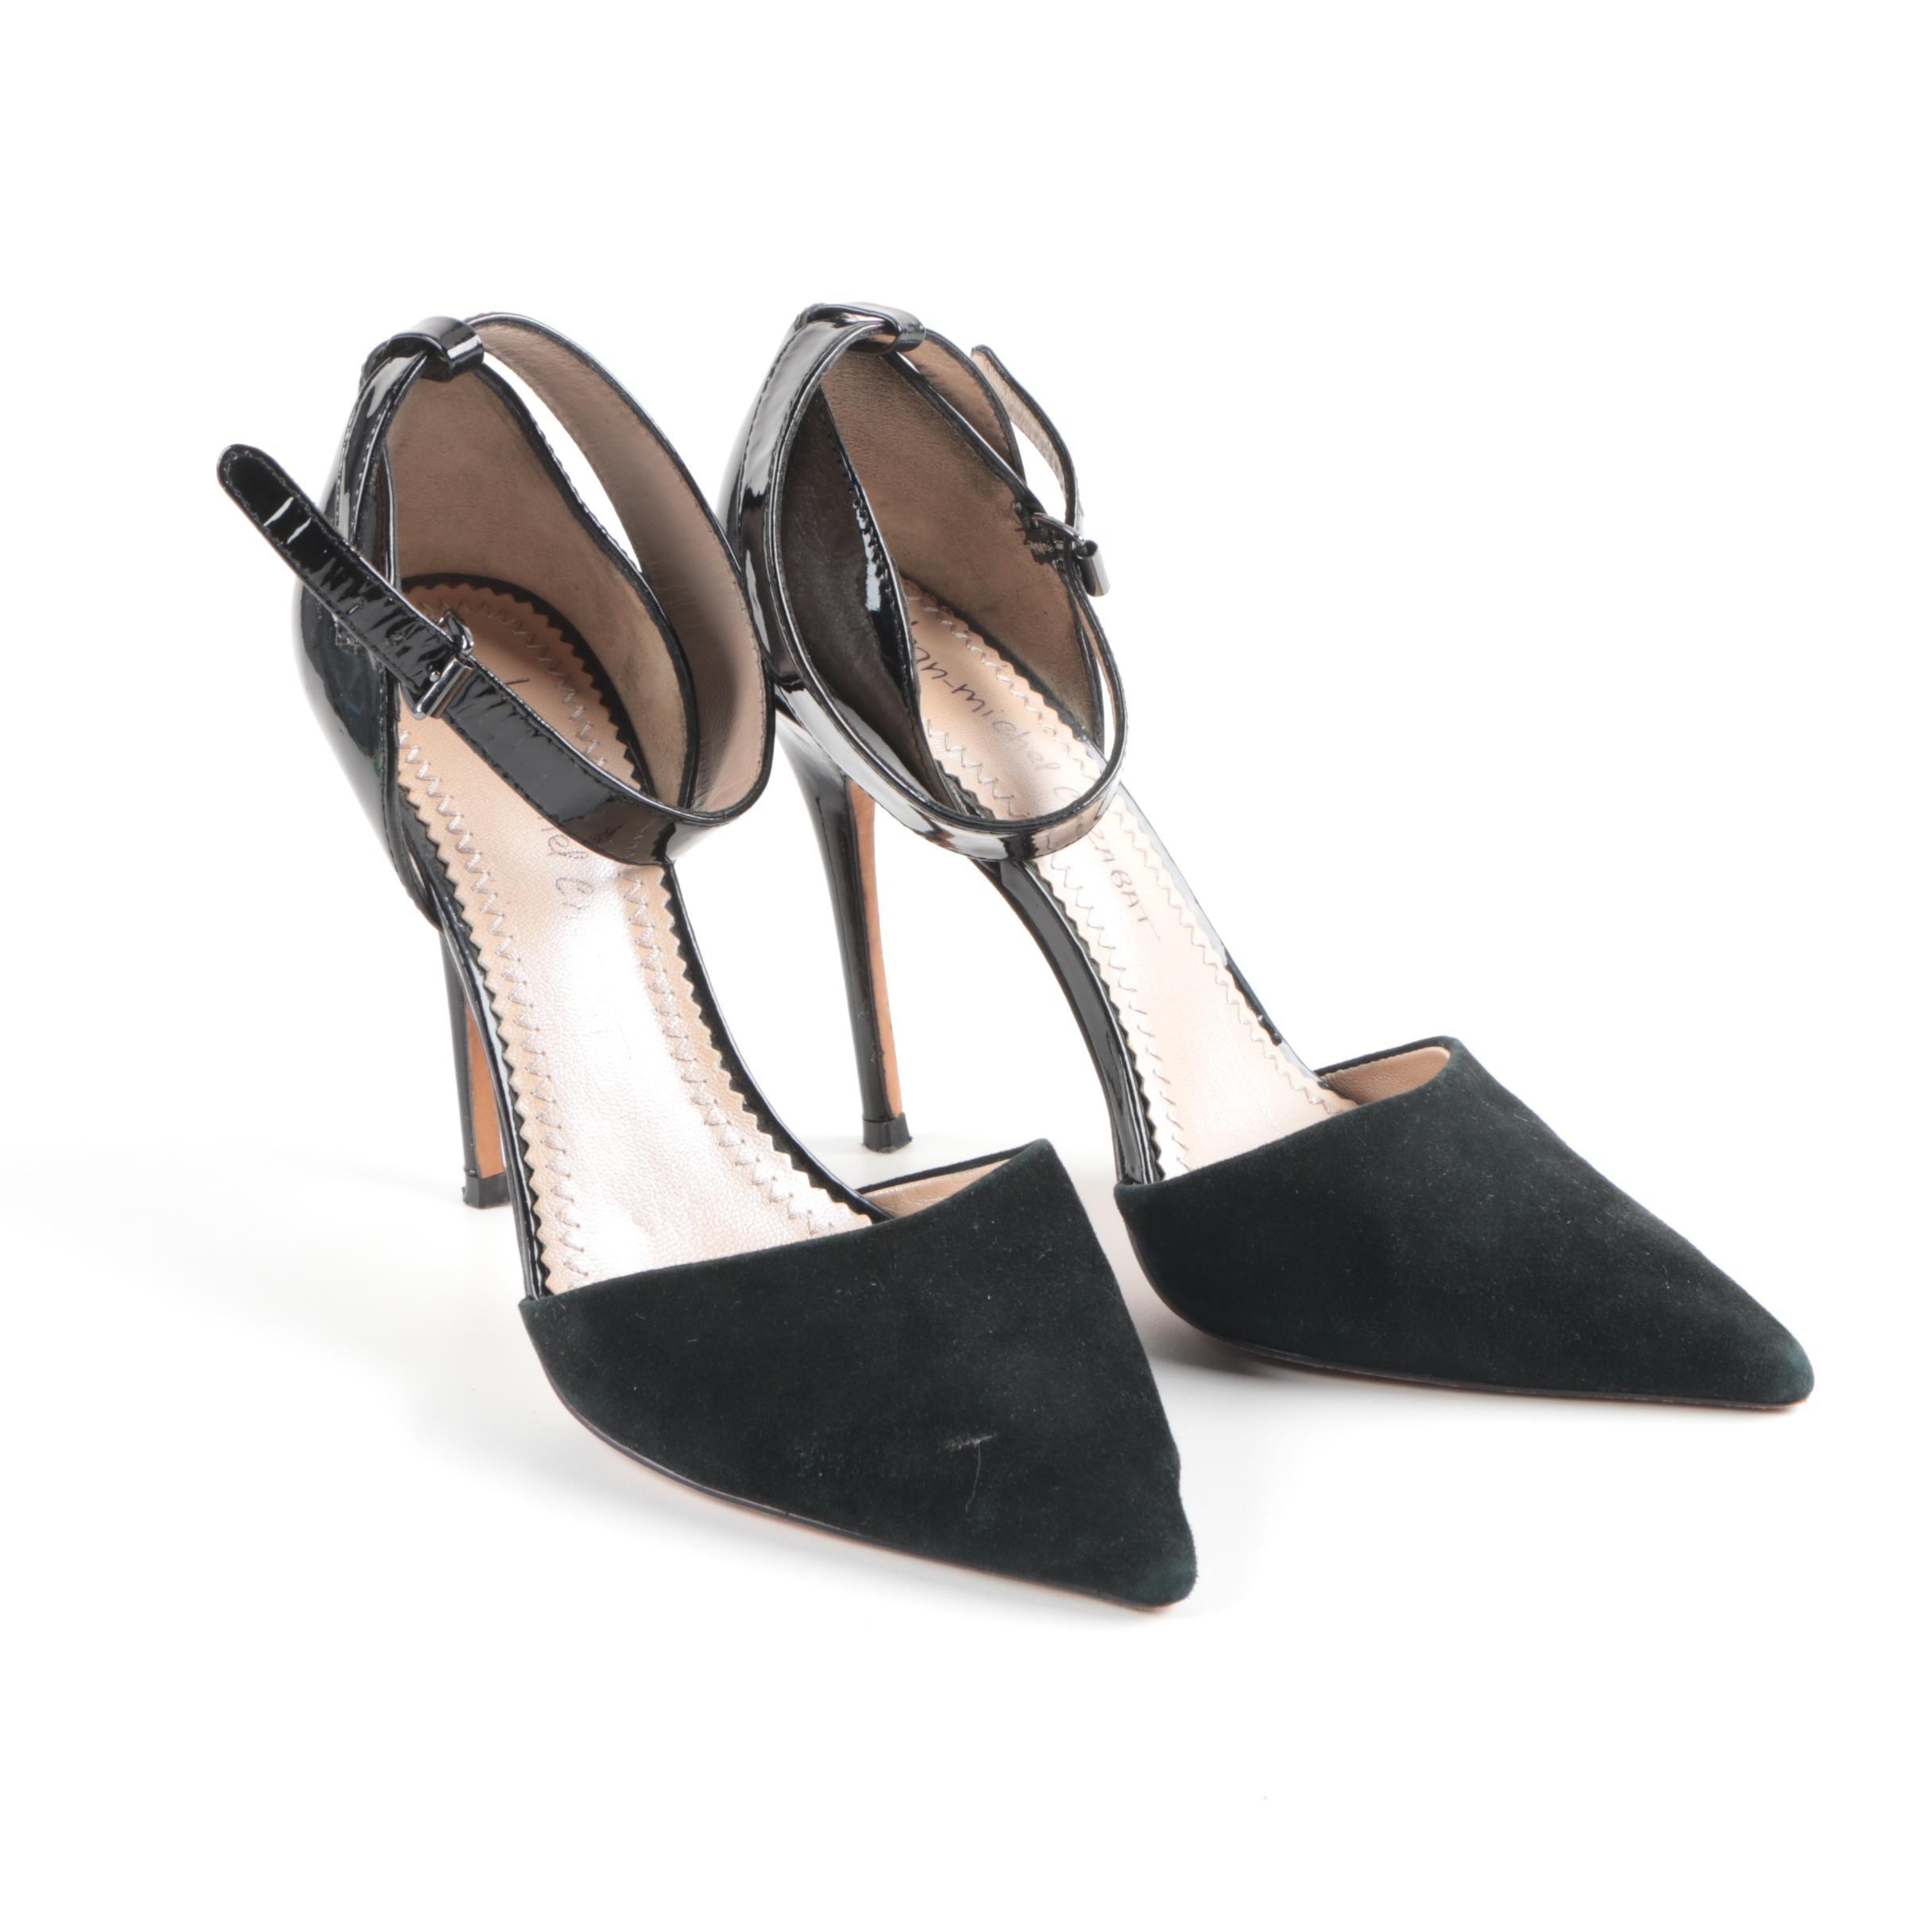 Women's Jean-Michael Cazabat Black Stiletto Heels